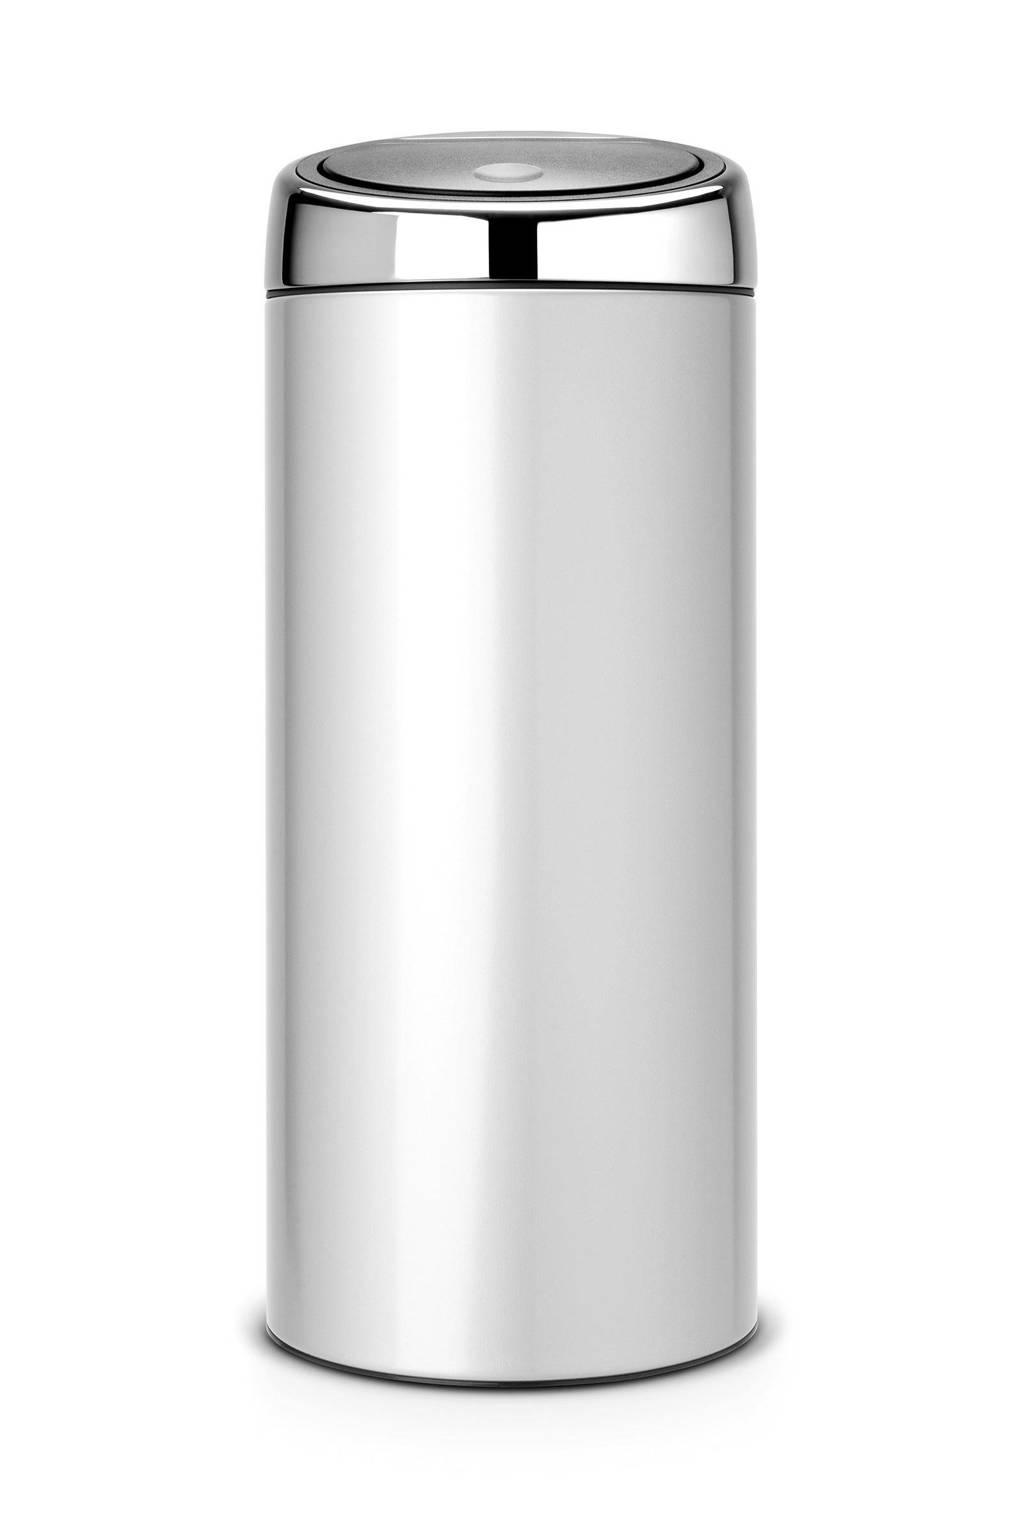 Brabantia Touch Bin 30 Liter Zwart.Brabantia Touch Bin 30 Liter Prullenbak Wehkamp